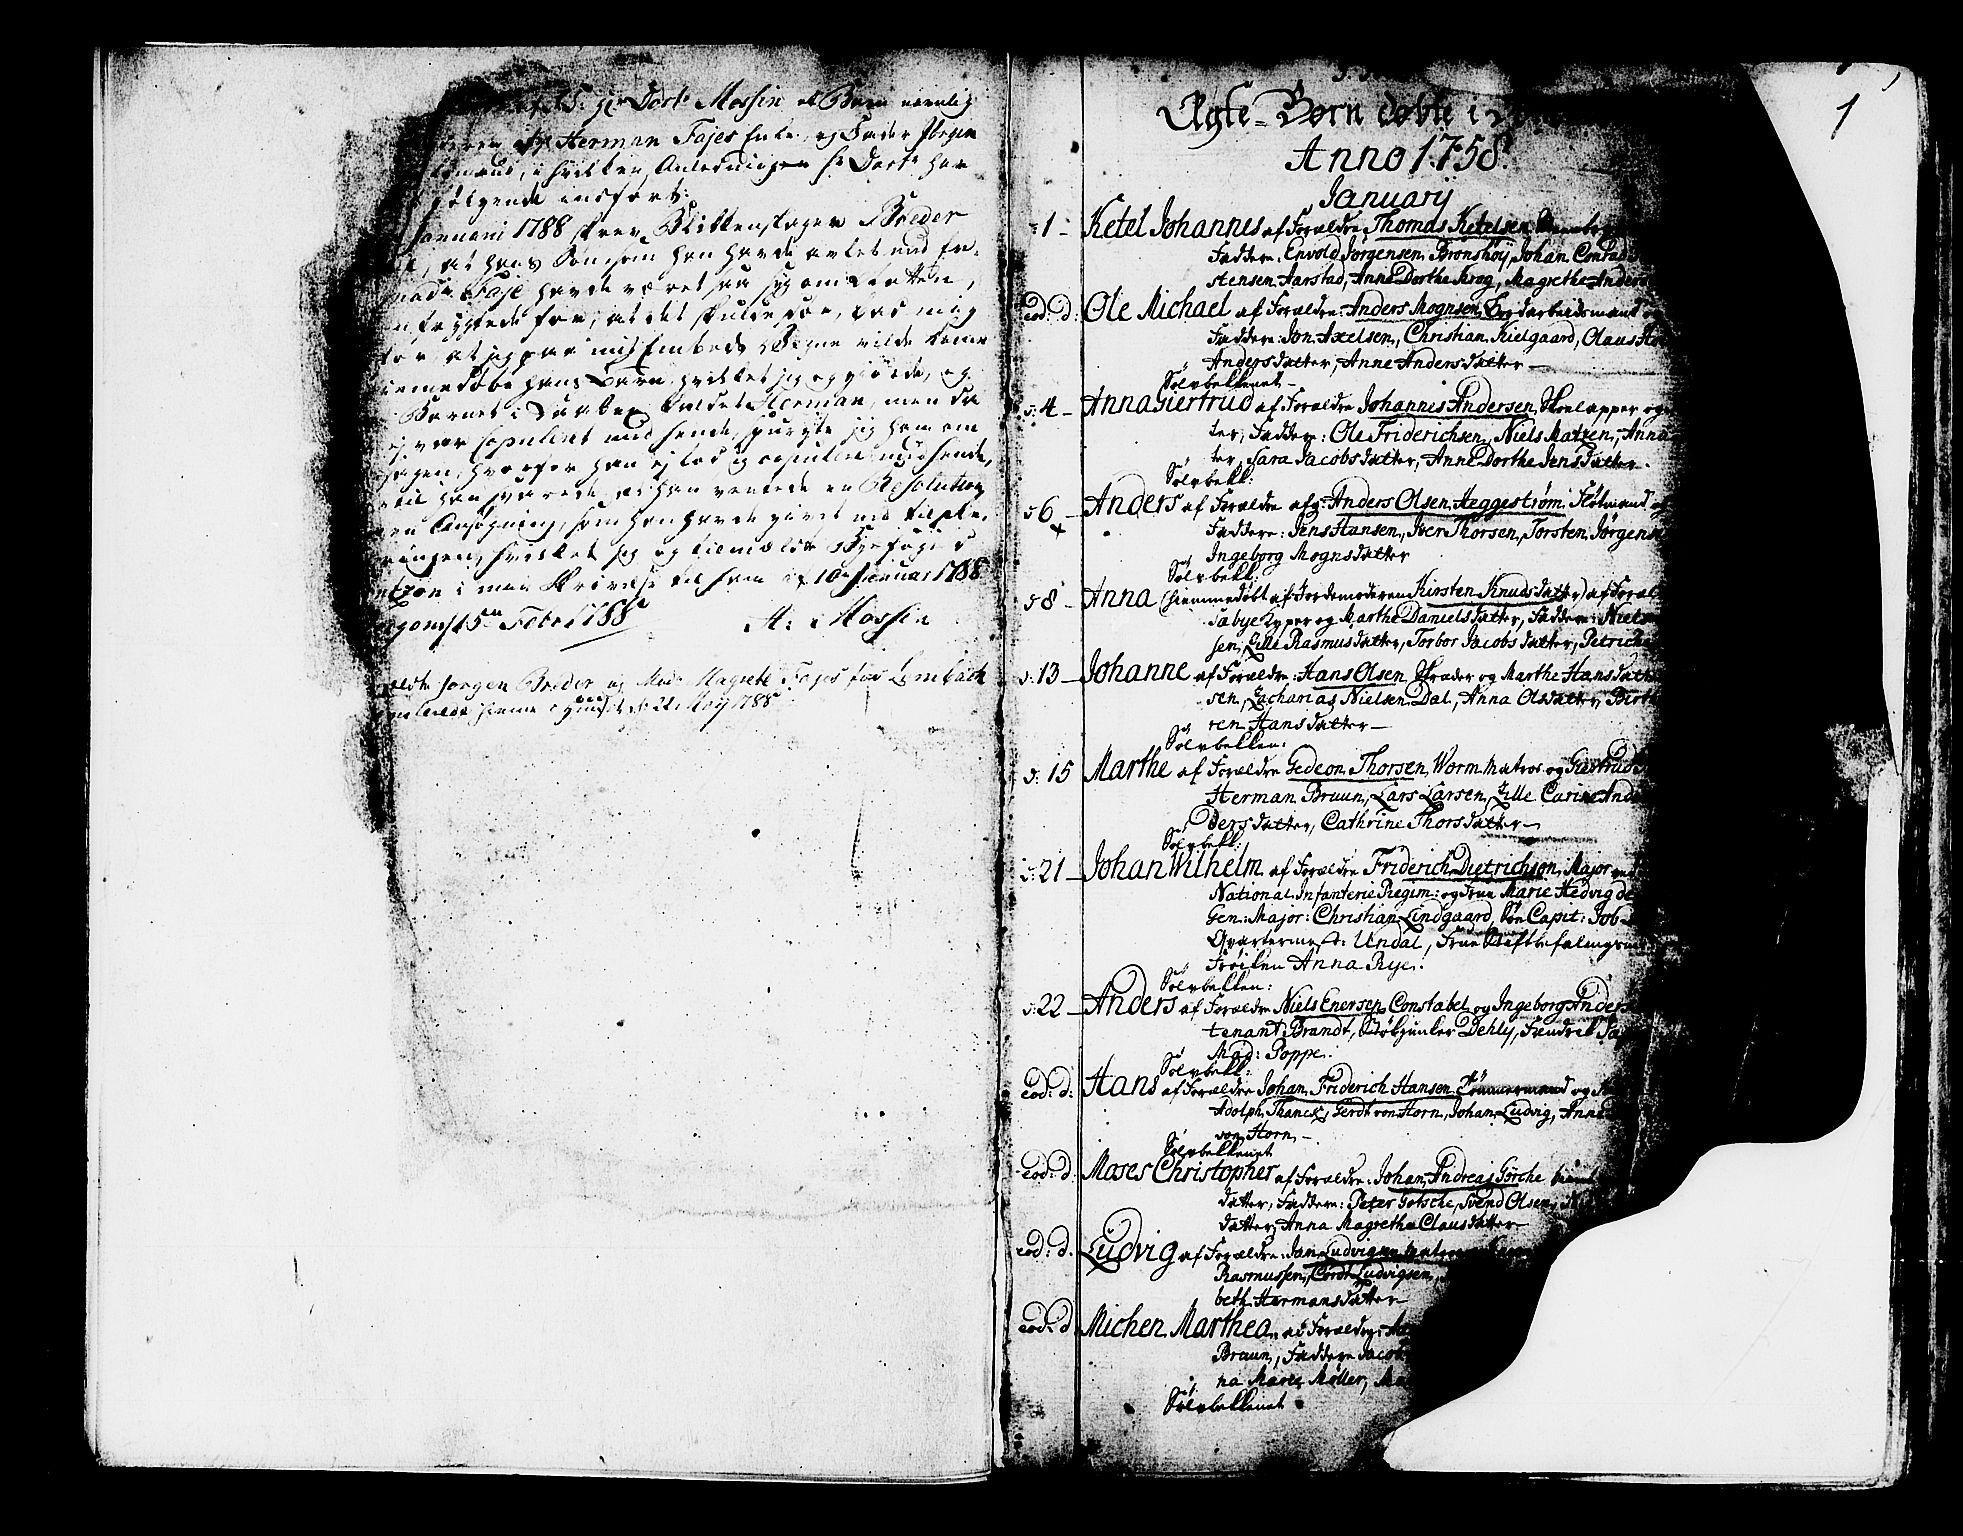 SAB, Domkirken Sokneprestembete, H/Haa/L0003: Ministerialbok nr. A 3, 1758-1789, s. 0-1